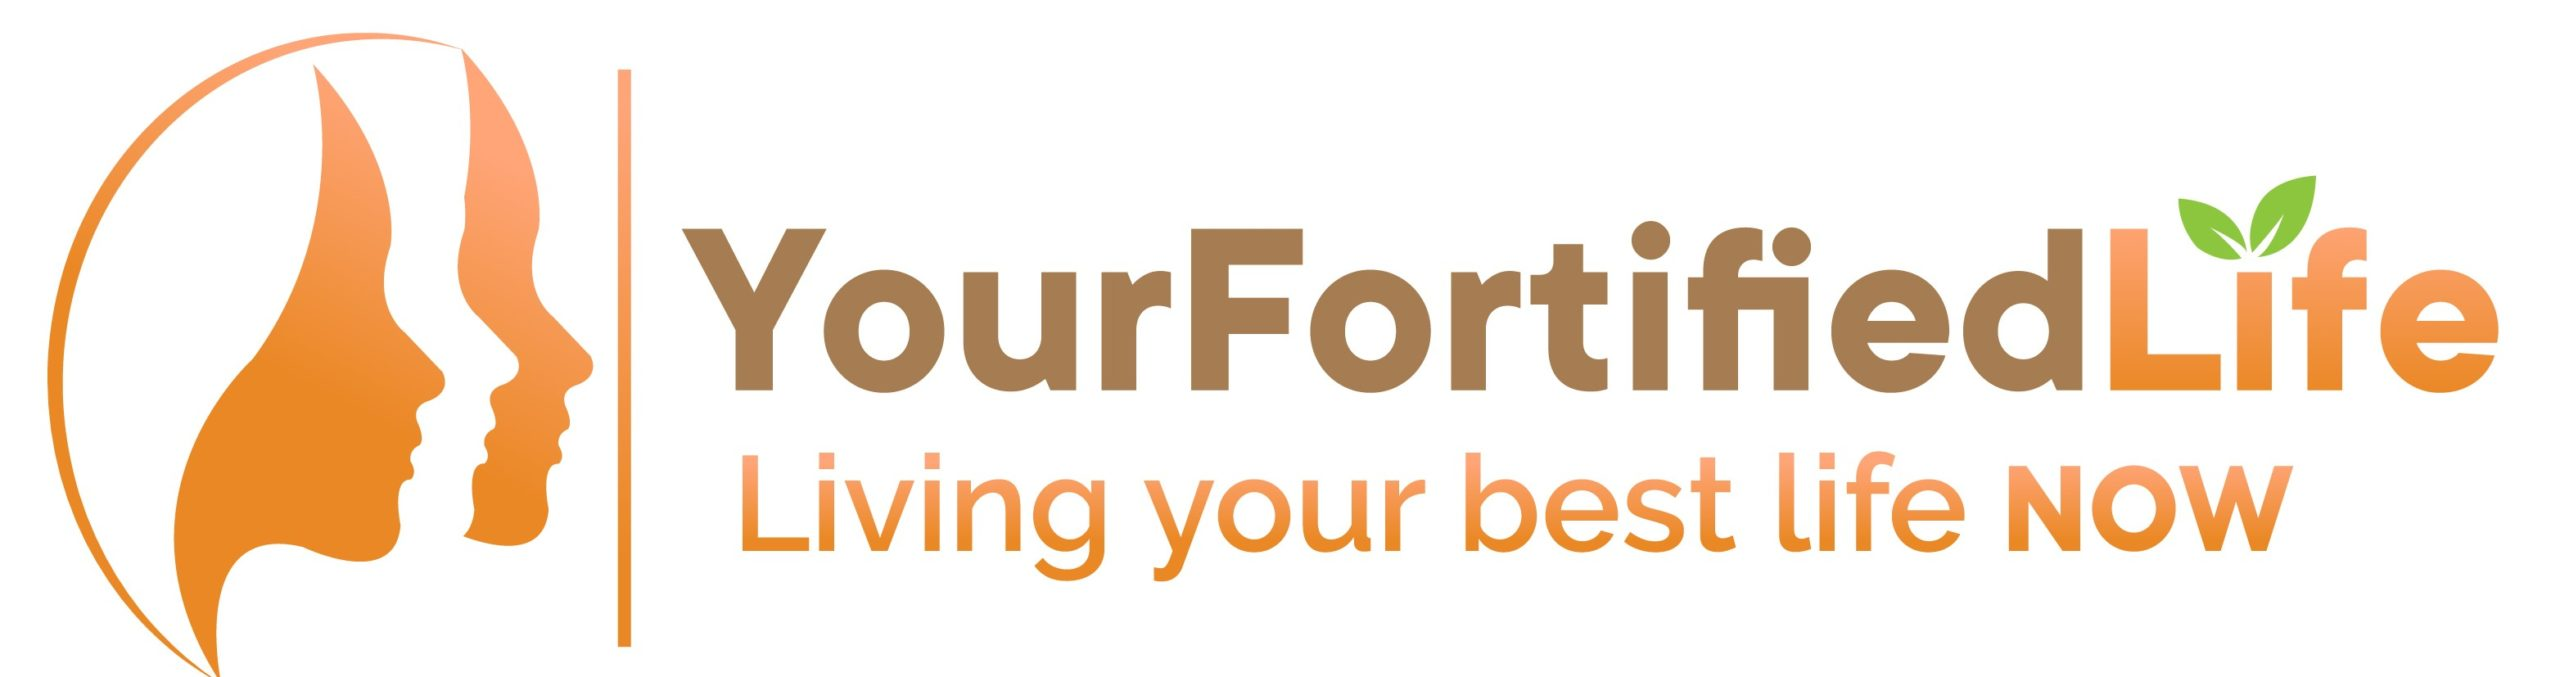 YourFortifiedLife.com